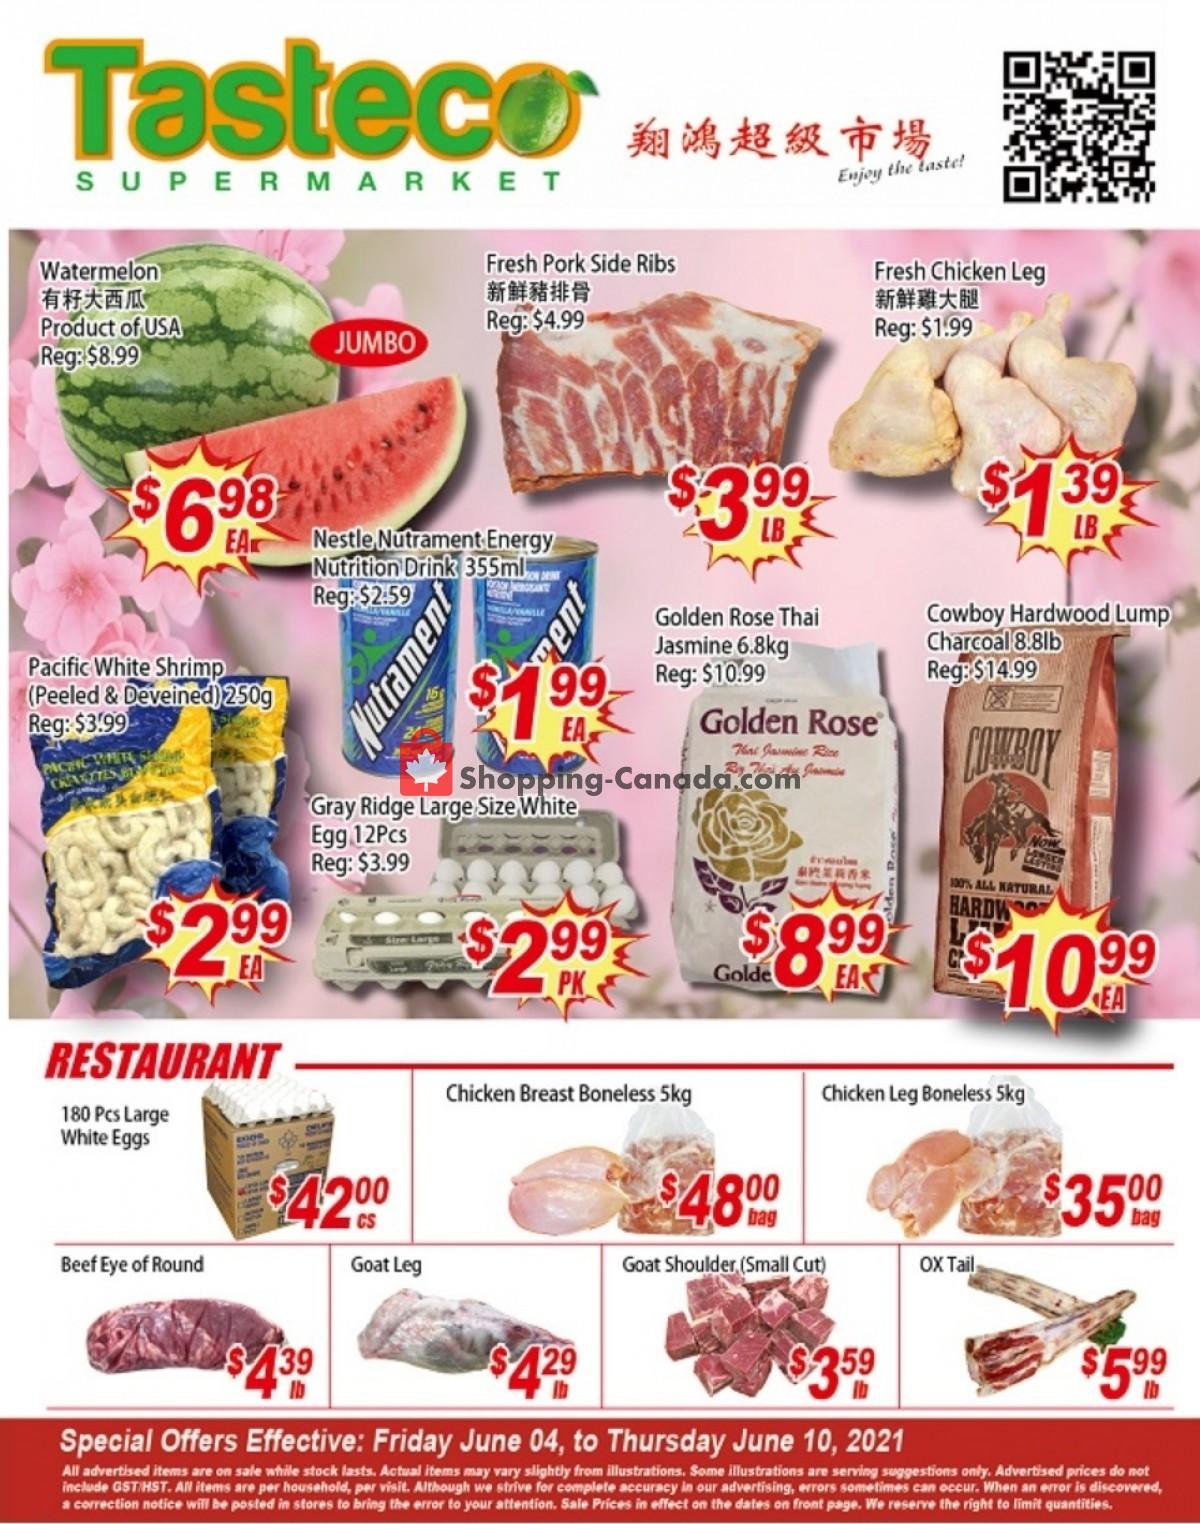 Flyer Tasteco Supermarket Canada - from Friday June 4, 2021 to Thursday June 10, 2021